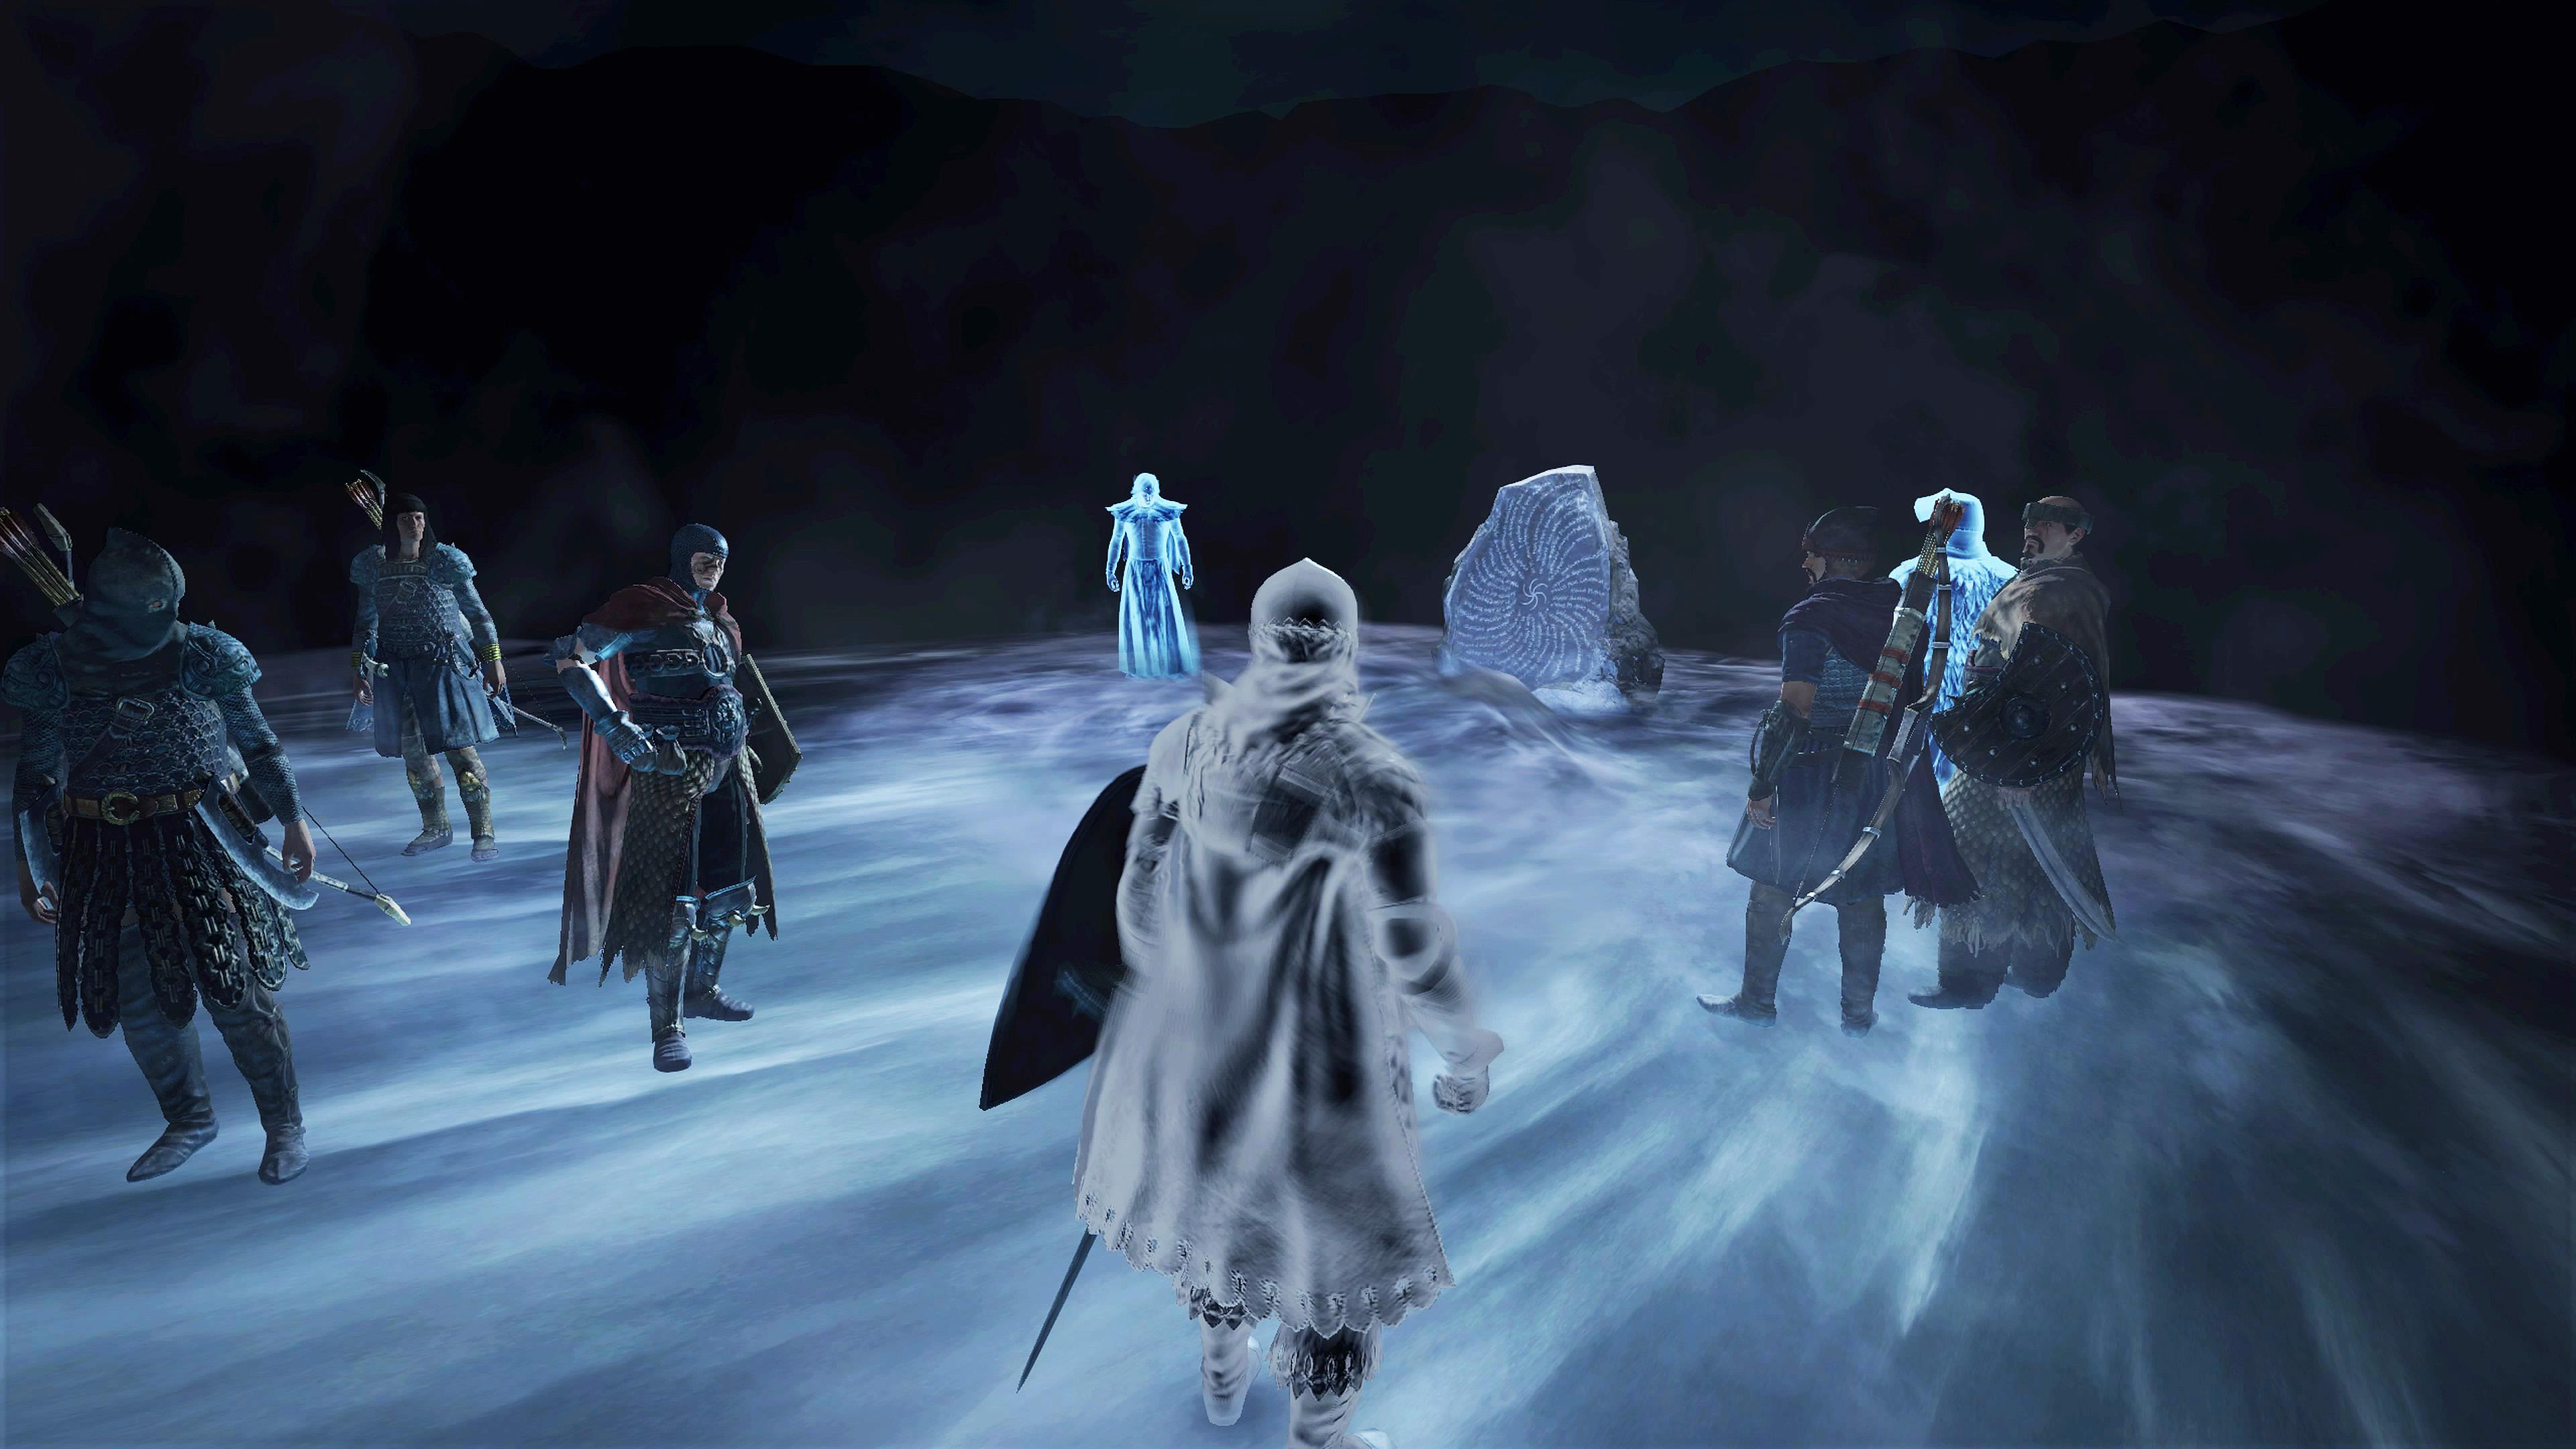 3. října vyjde Dragon's Dogma: Dark Arisen pro PS4 a Xbox One 148232